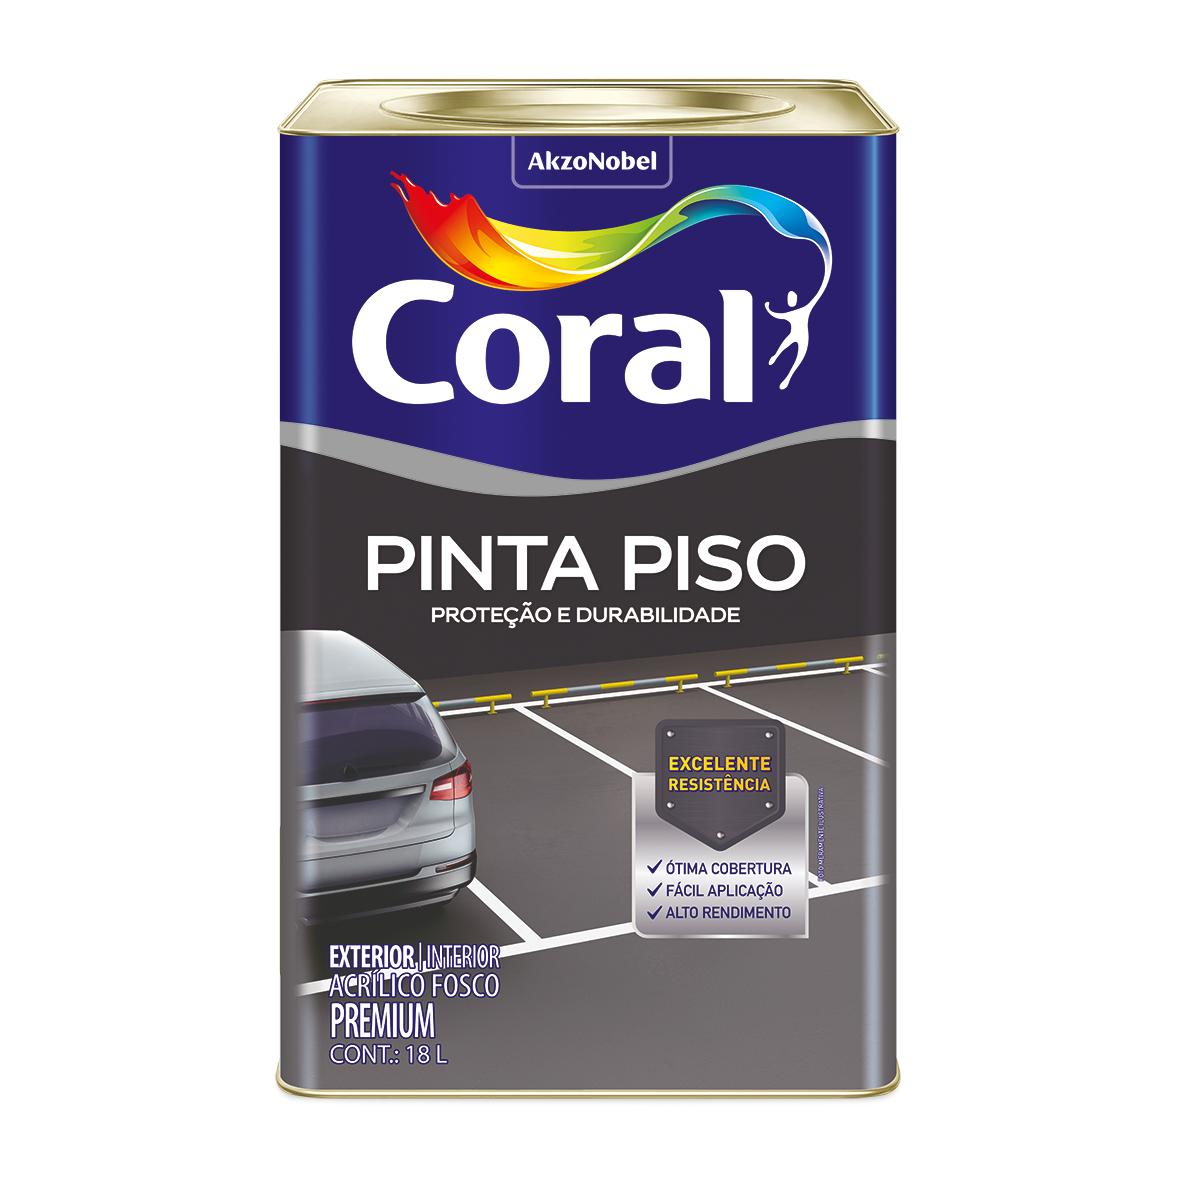 Tinta Acrilica Fosco Premium 18L - Azul - Coralpiso Coral